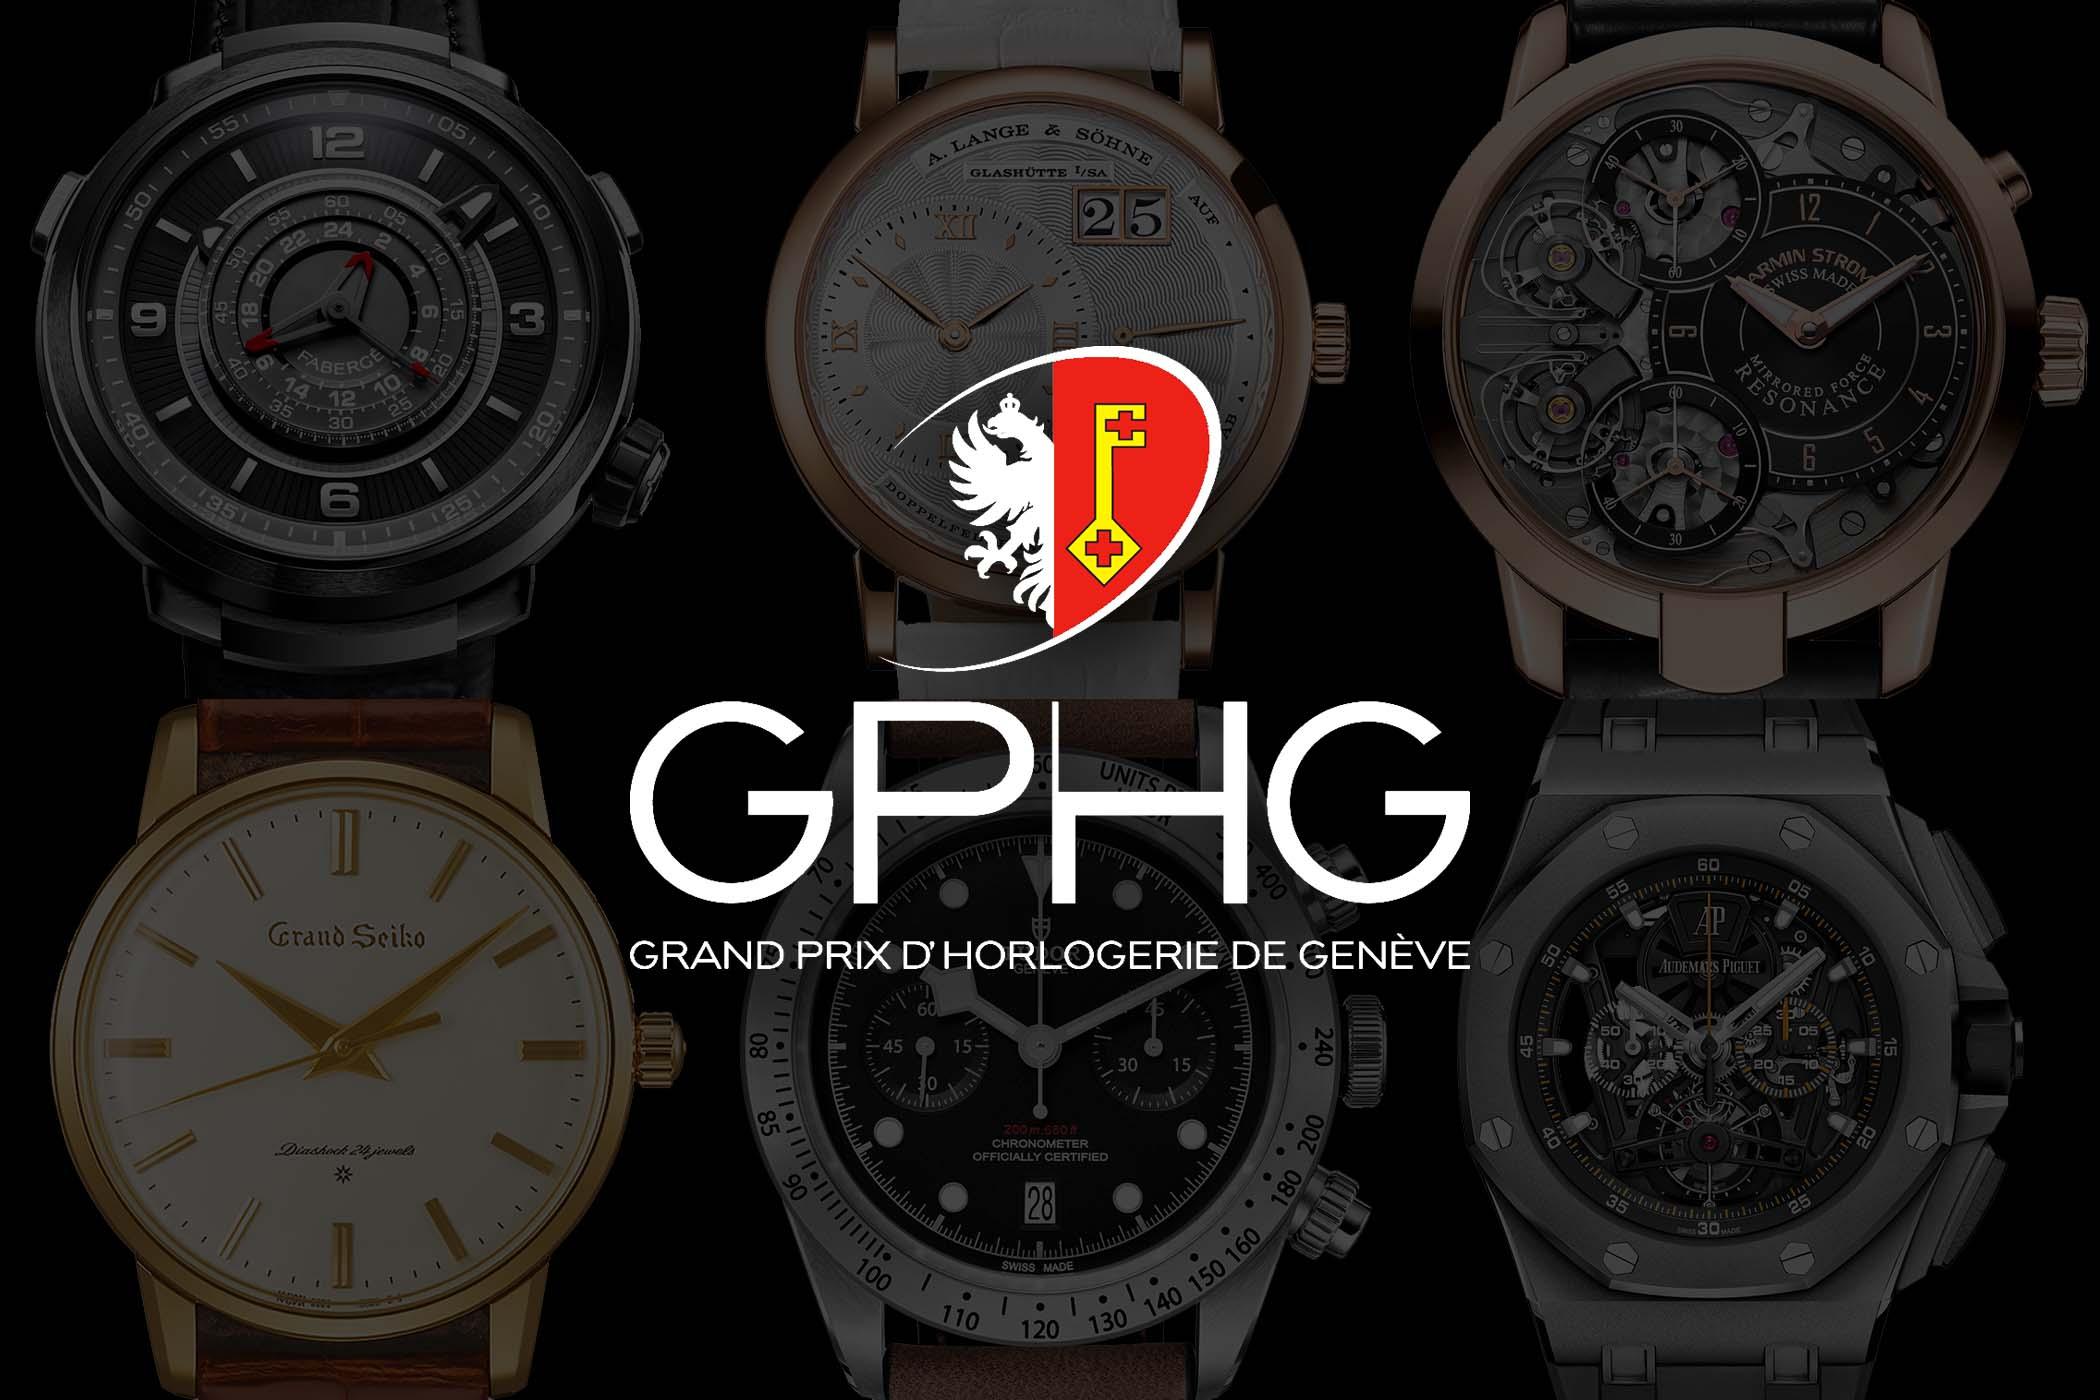 GPHG 2017 grand prix horlogerie de Geneve - Finalists announced